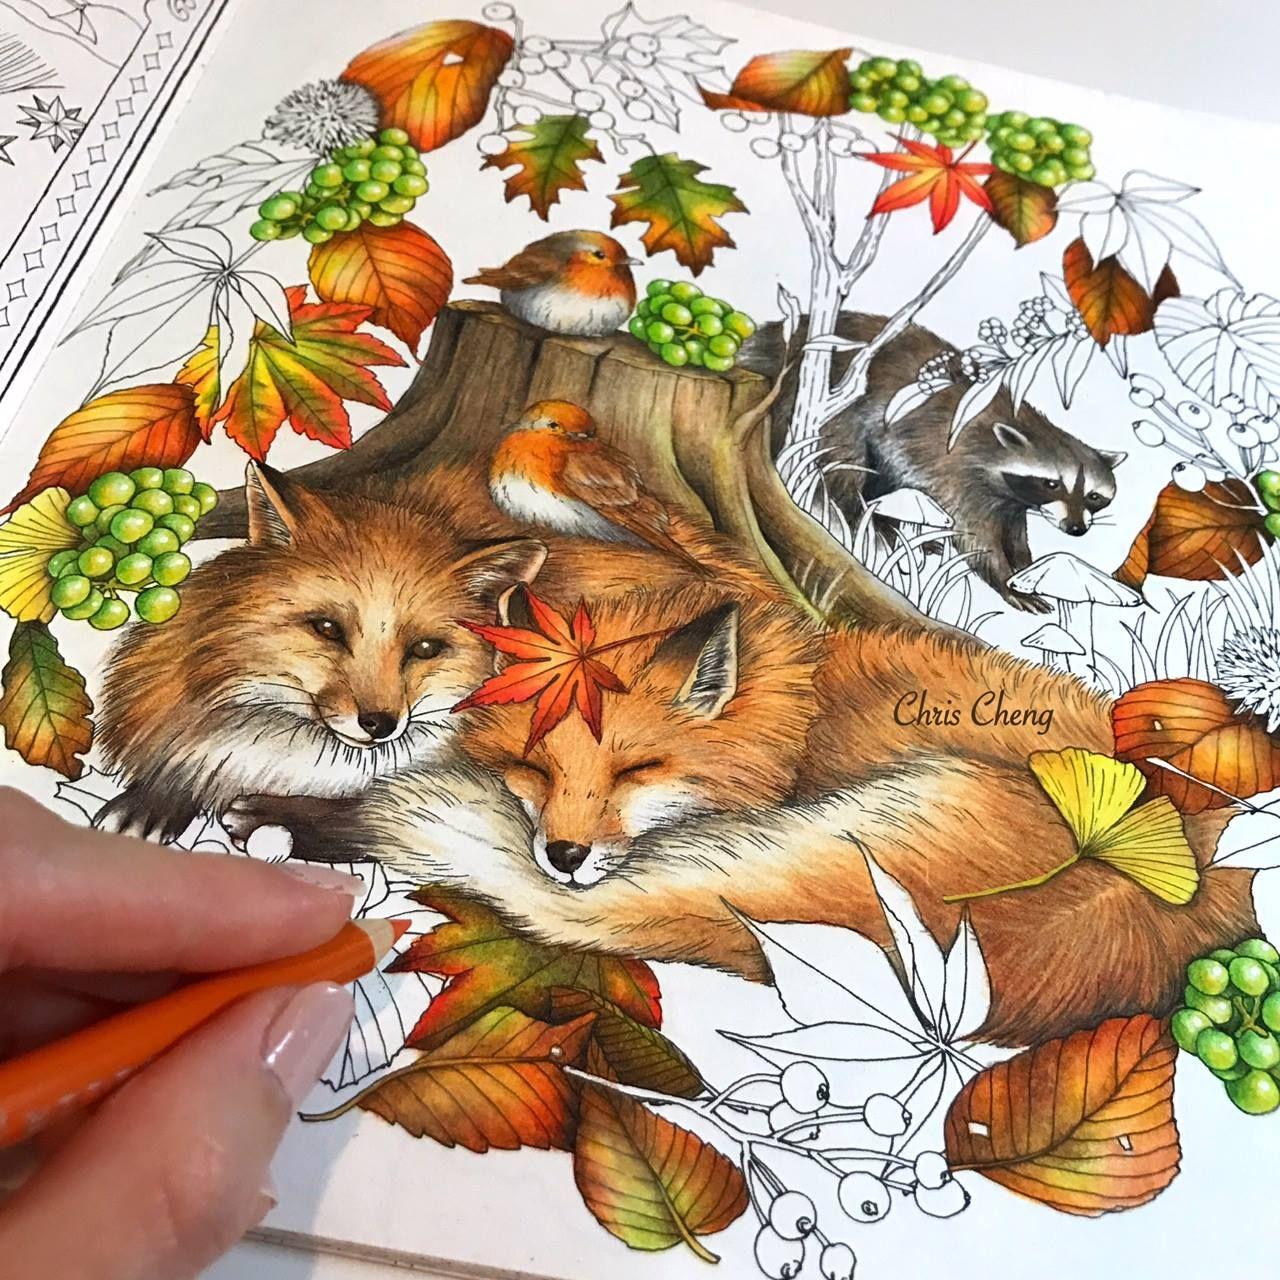 Chris Cheng Coloring Book Art Color Pencil Art Enchanted Forest Coloring